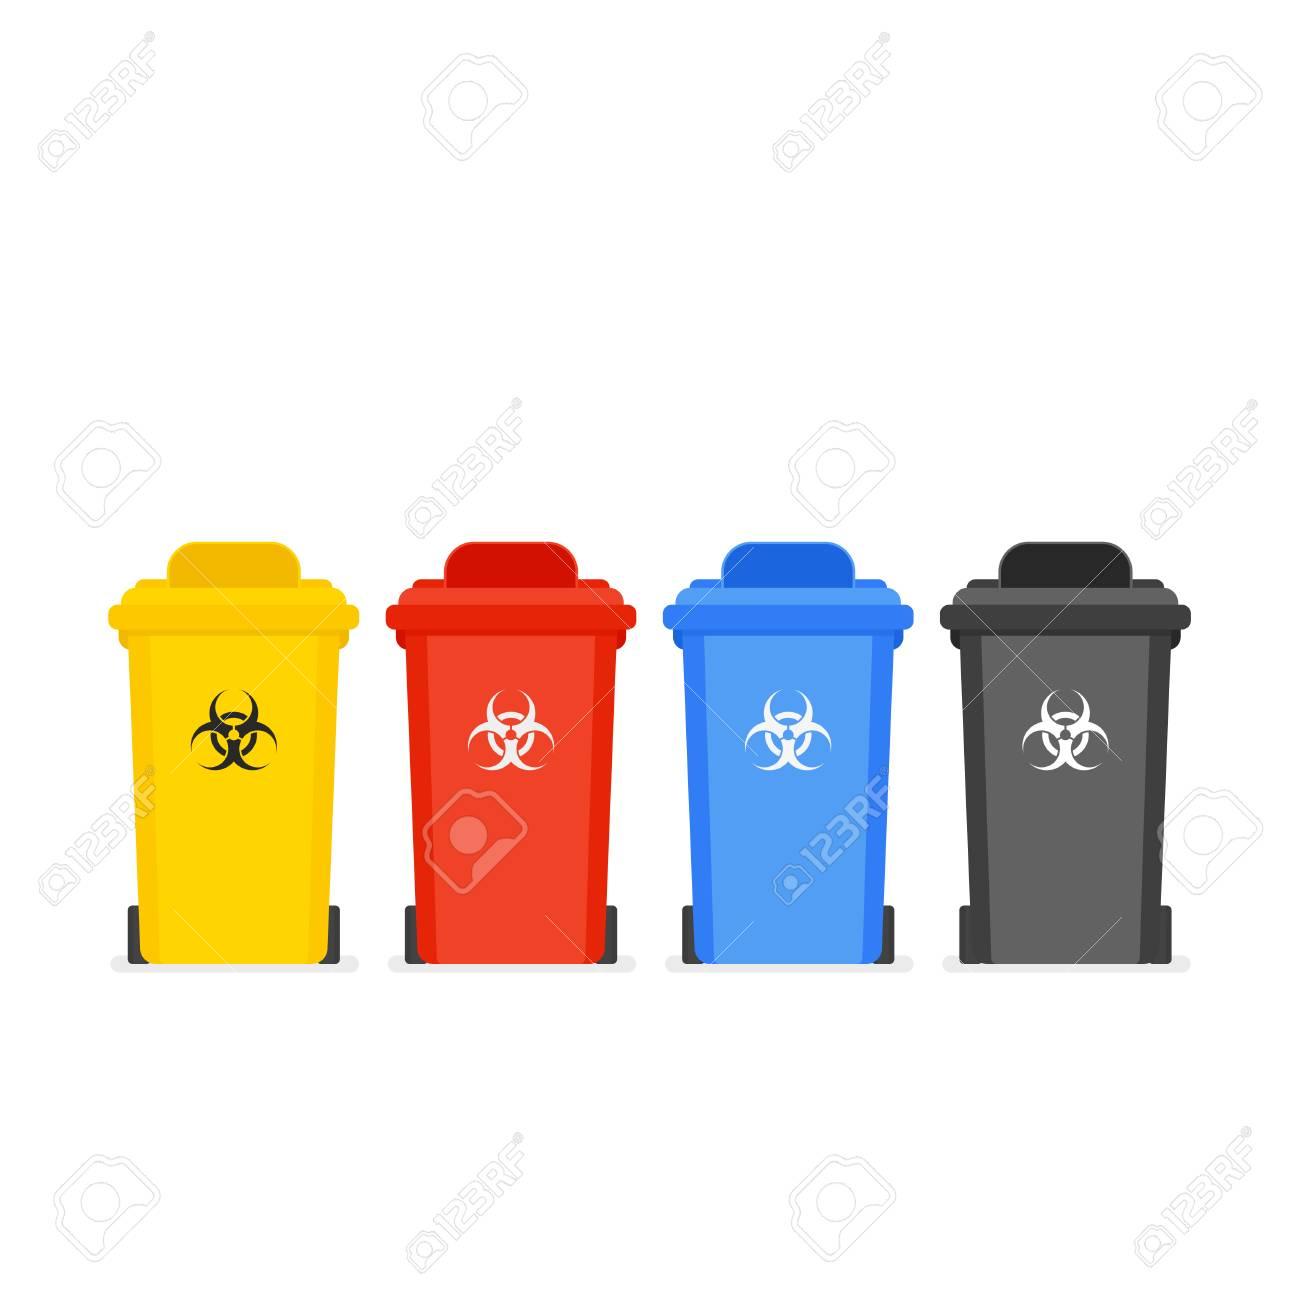 Medical waste bin icon set - 100720176